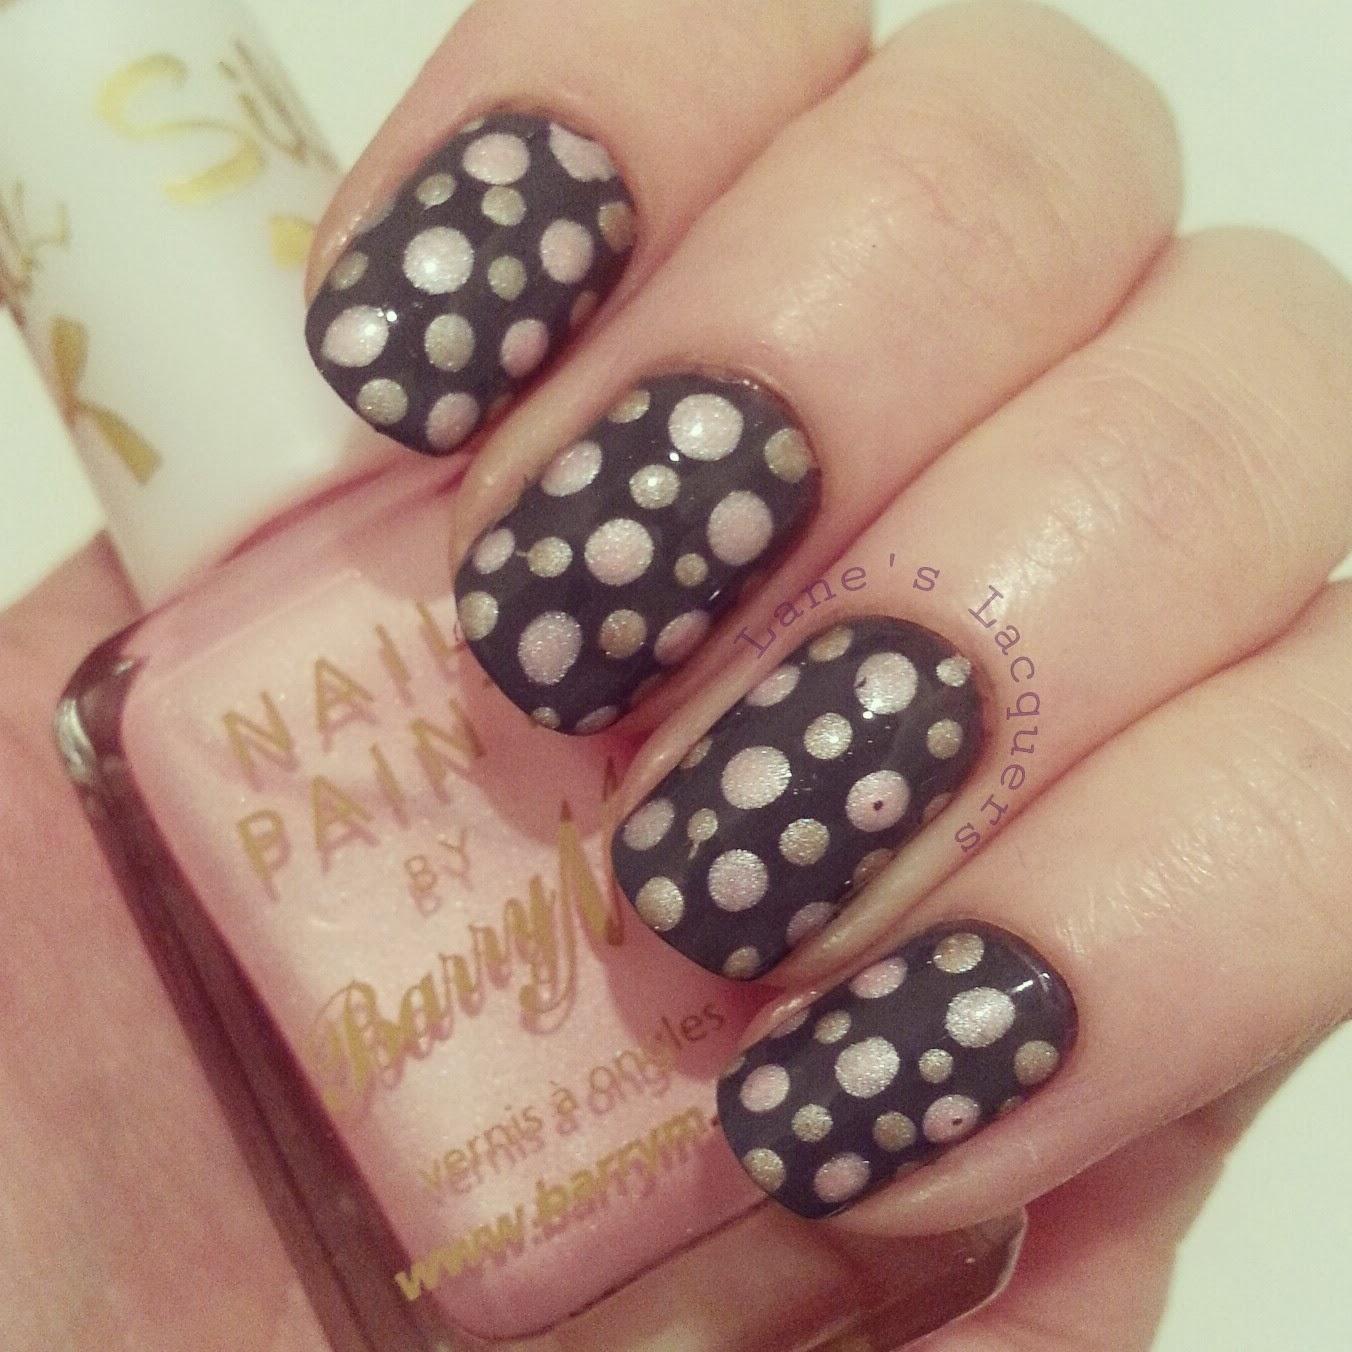 tri-polish-challenge-grey-pink-brown-spotty-nails